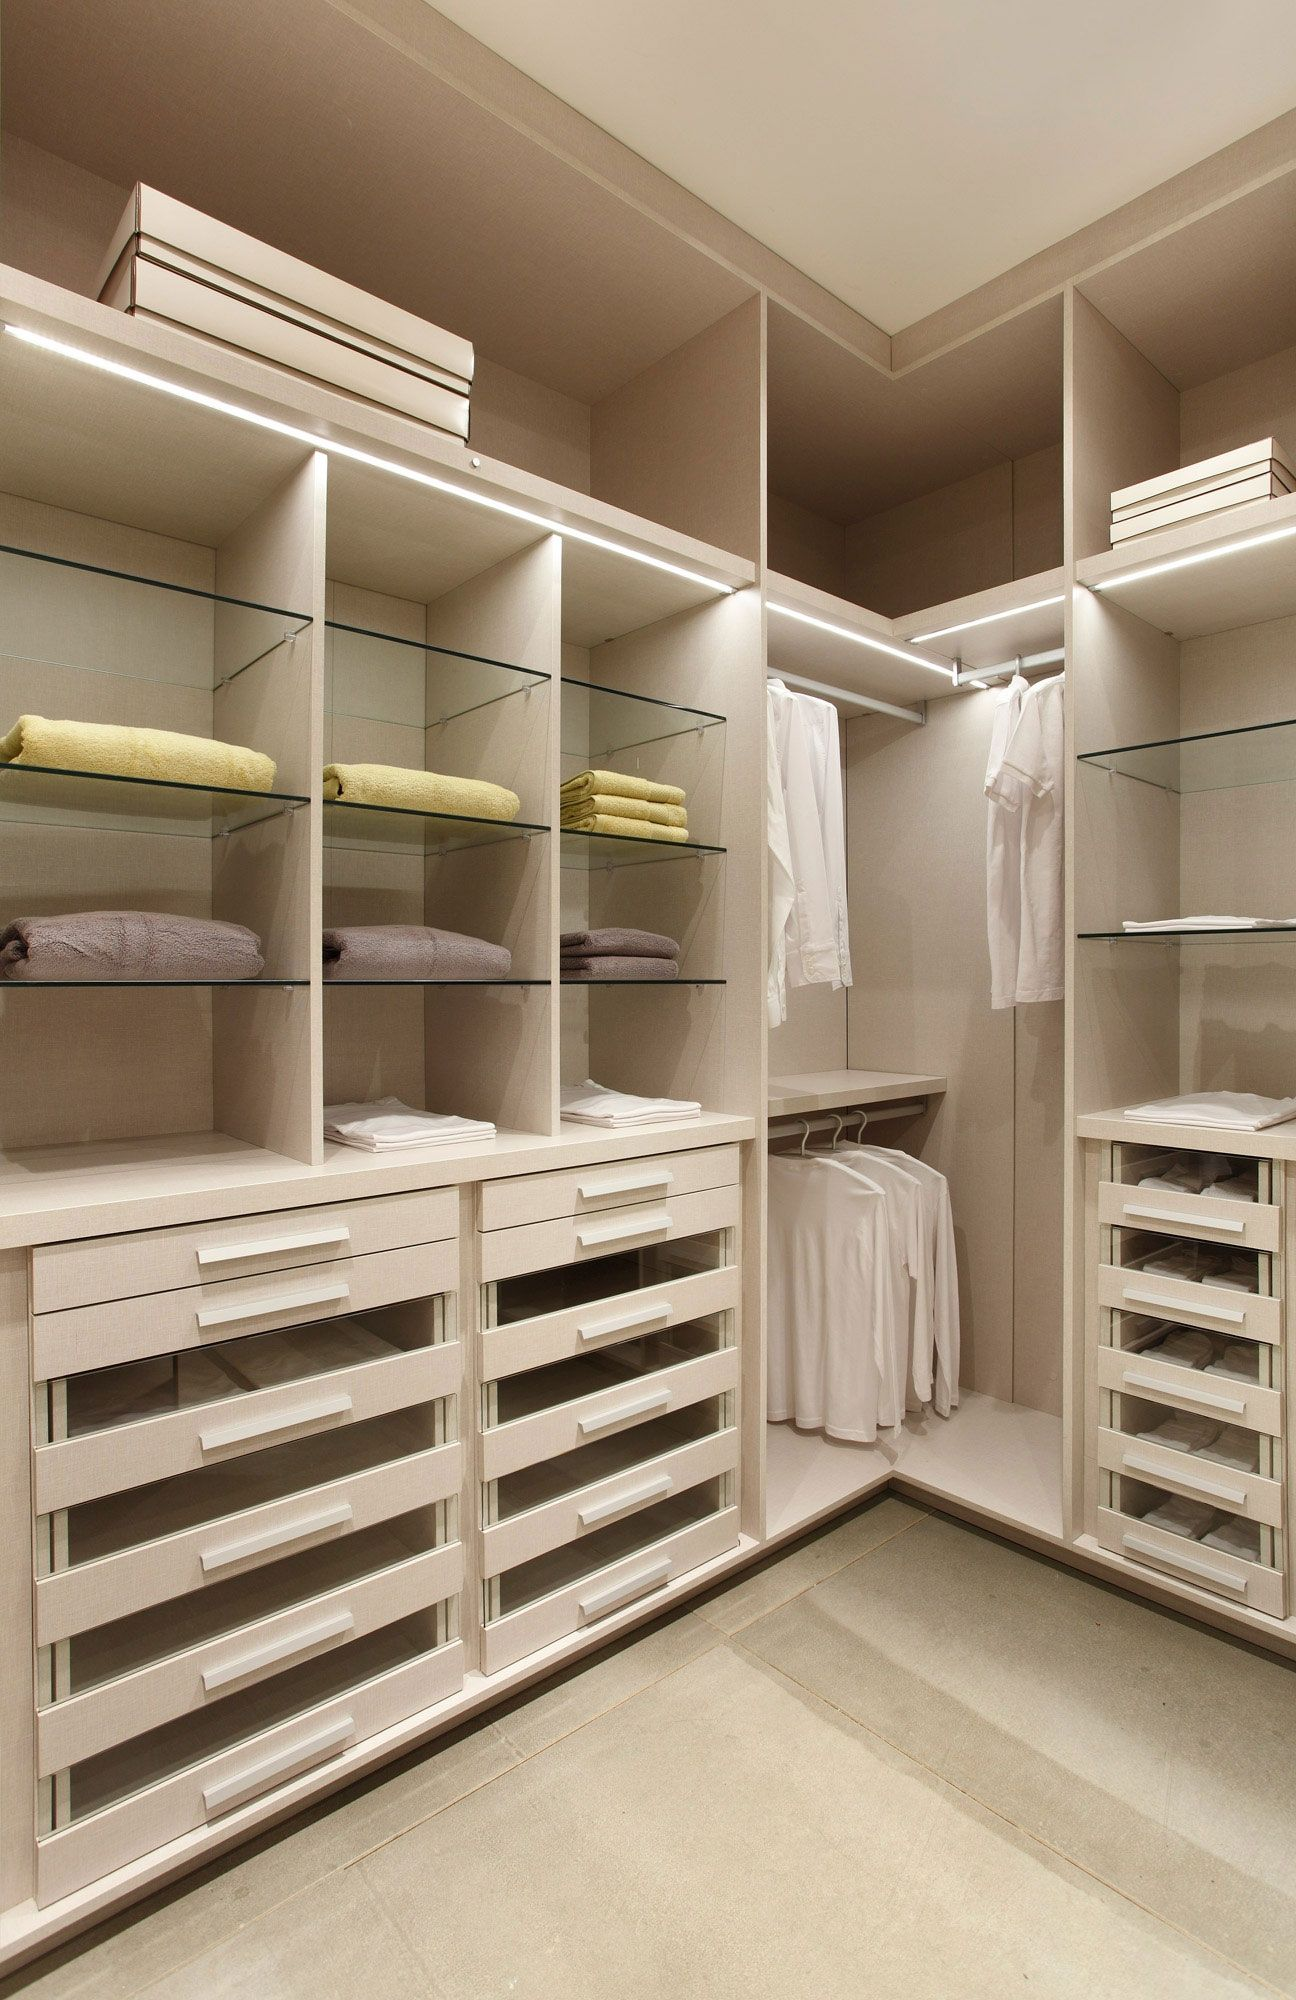 Captivating Closet Design Ideas, Cupboards, Cabinets, Wardrobes, Locker, Room Makeover,  Design